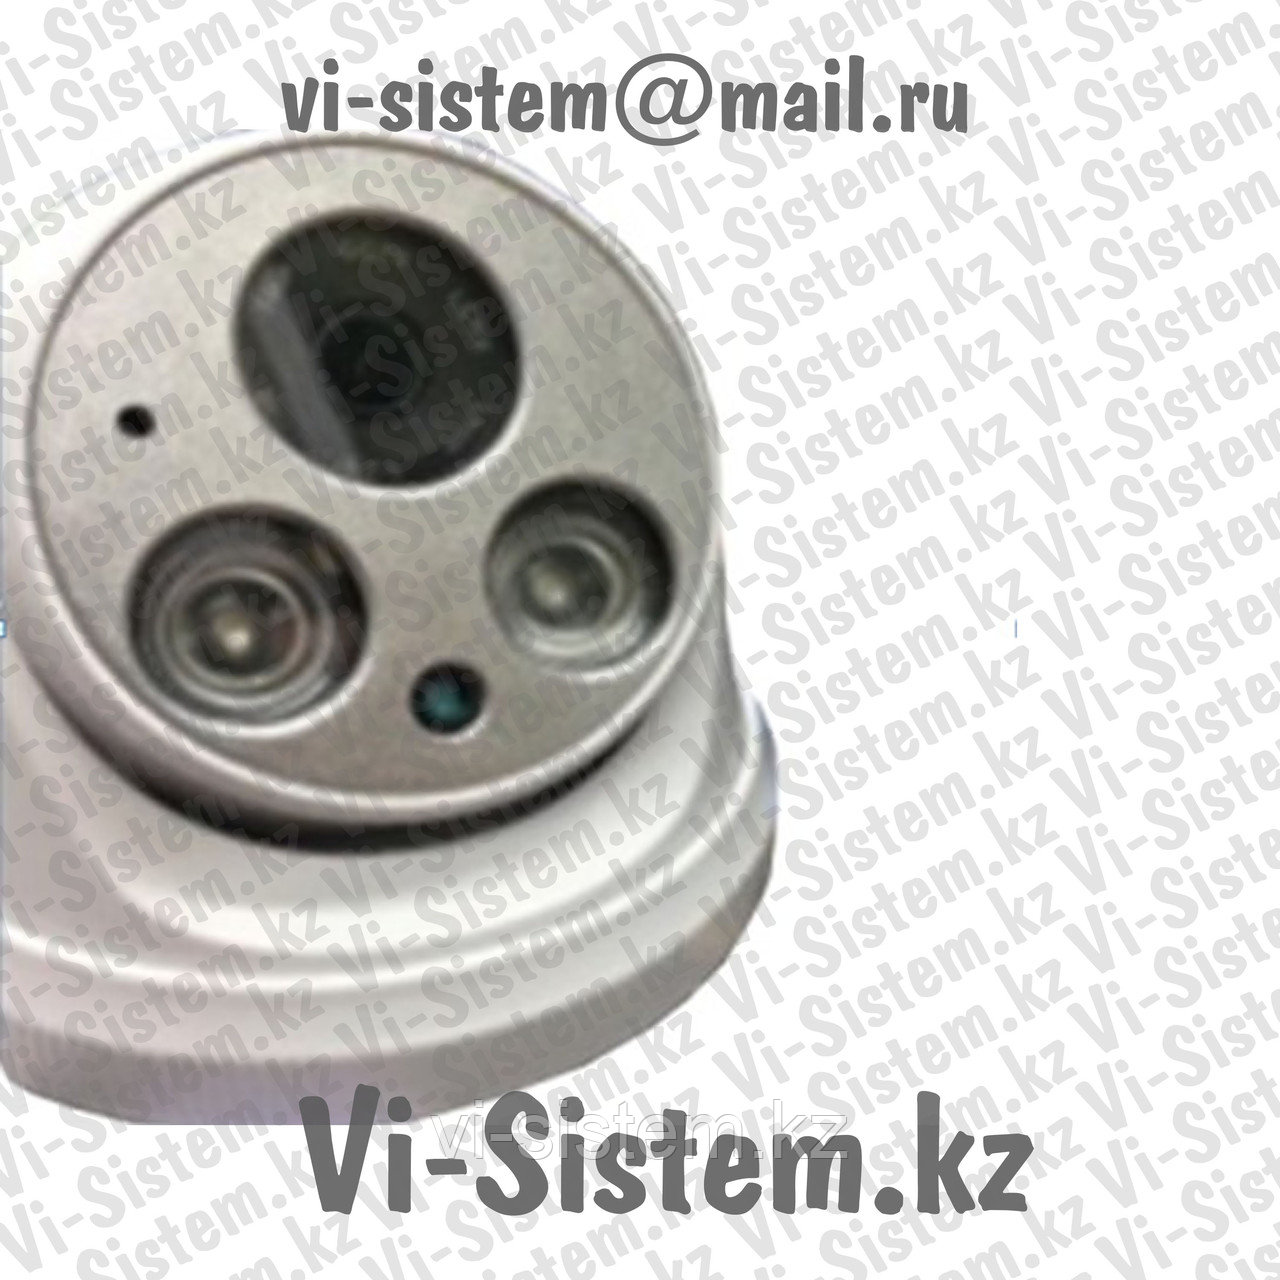 IP-Видеокамера SYNQAR IP-212 2MP